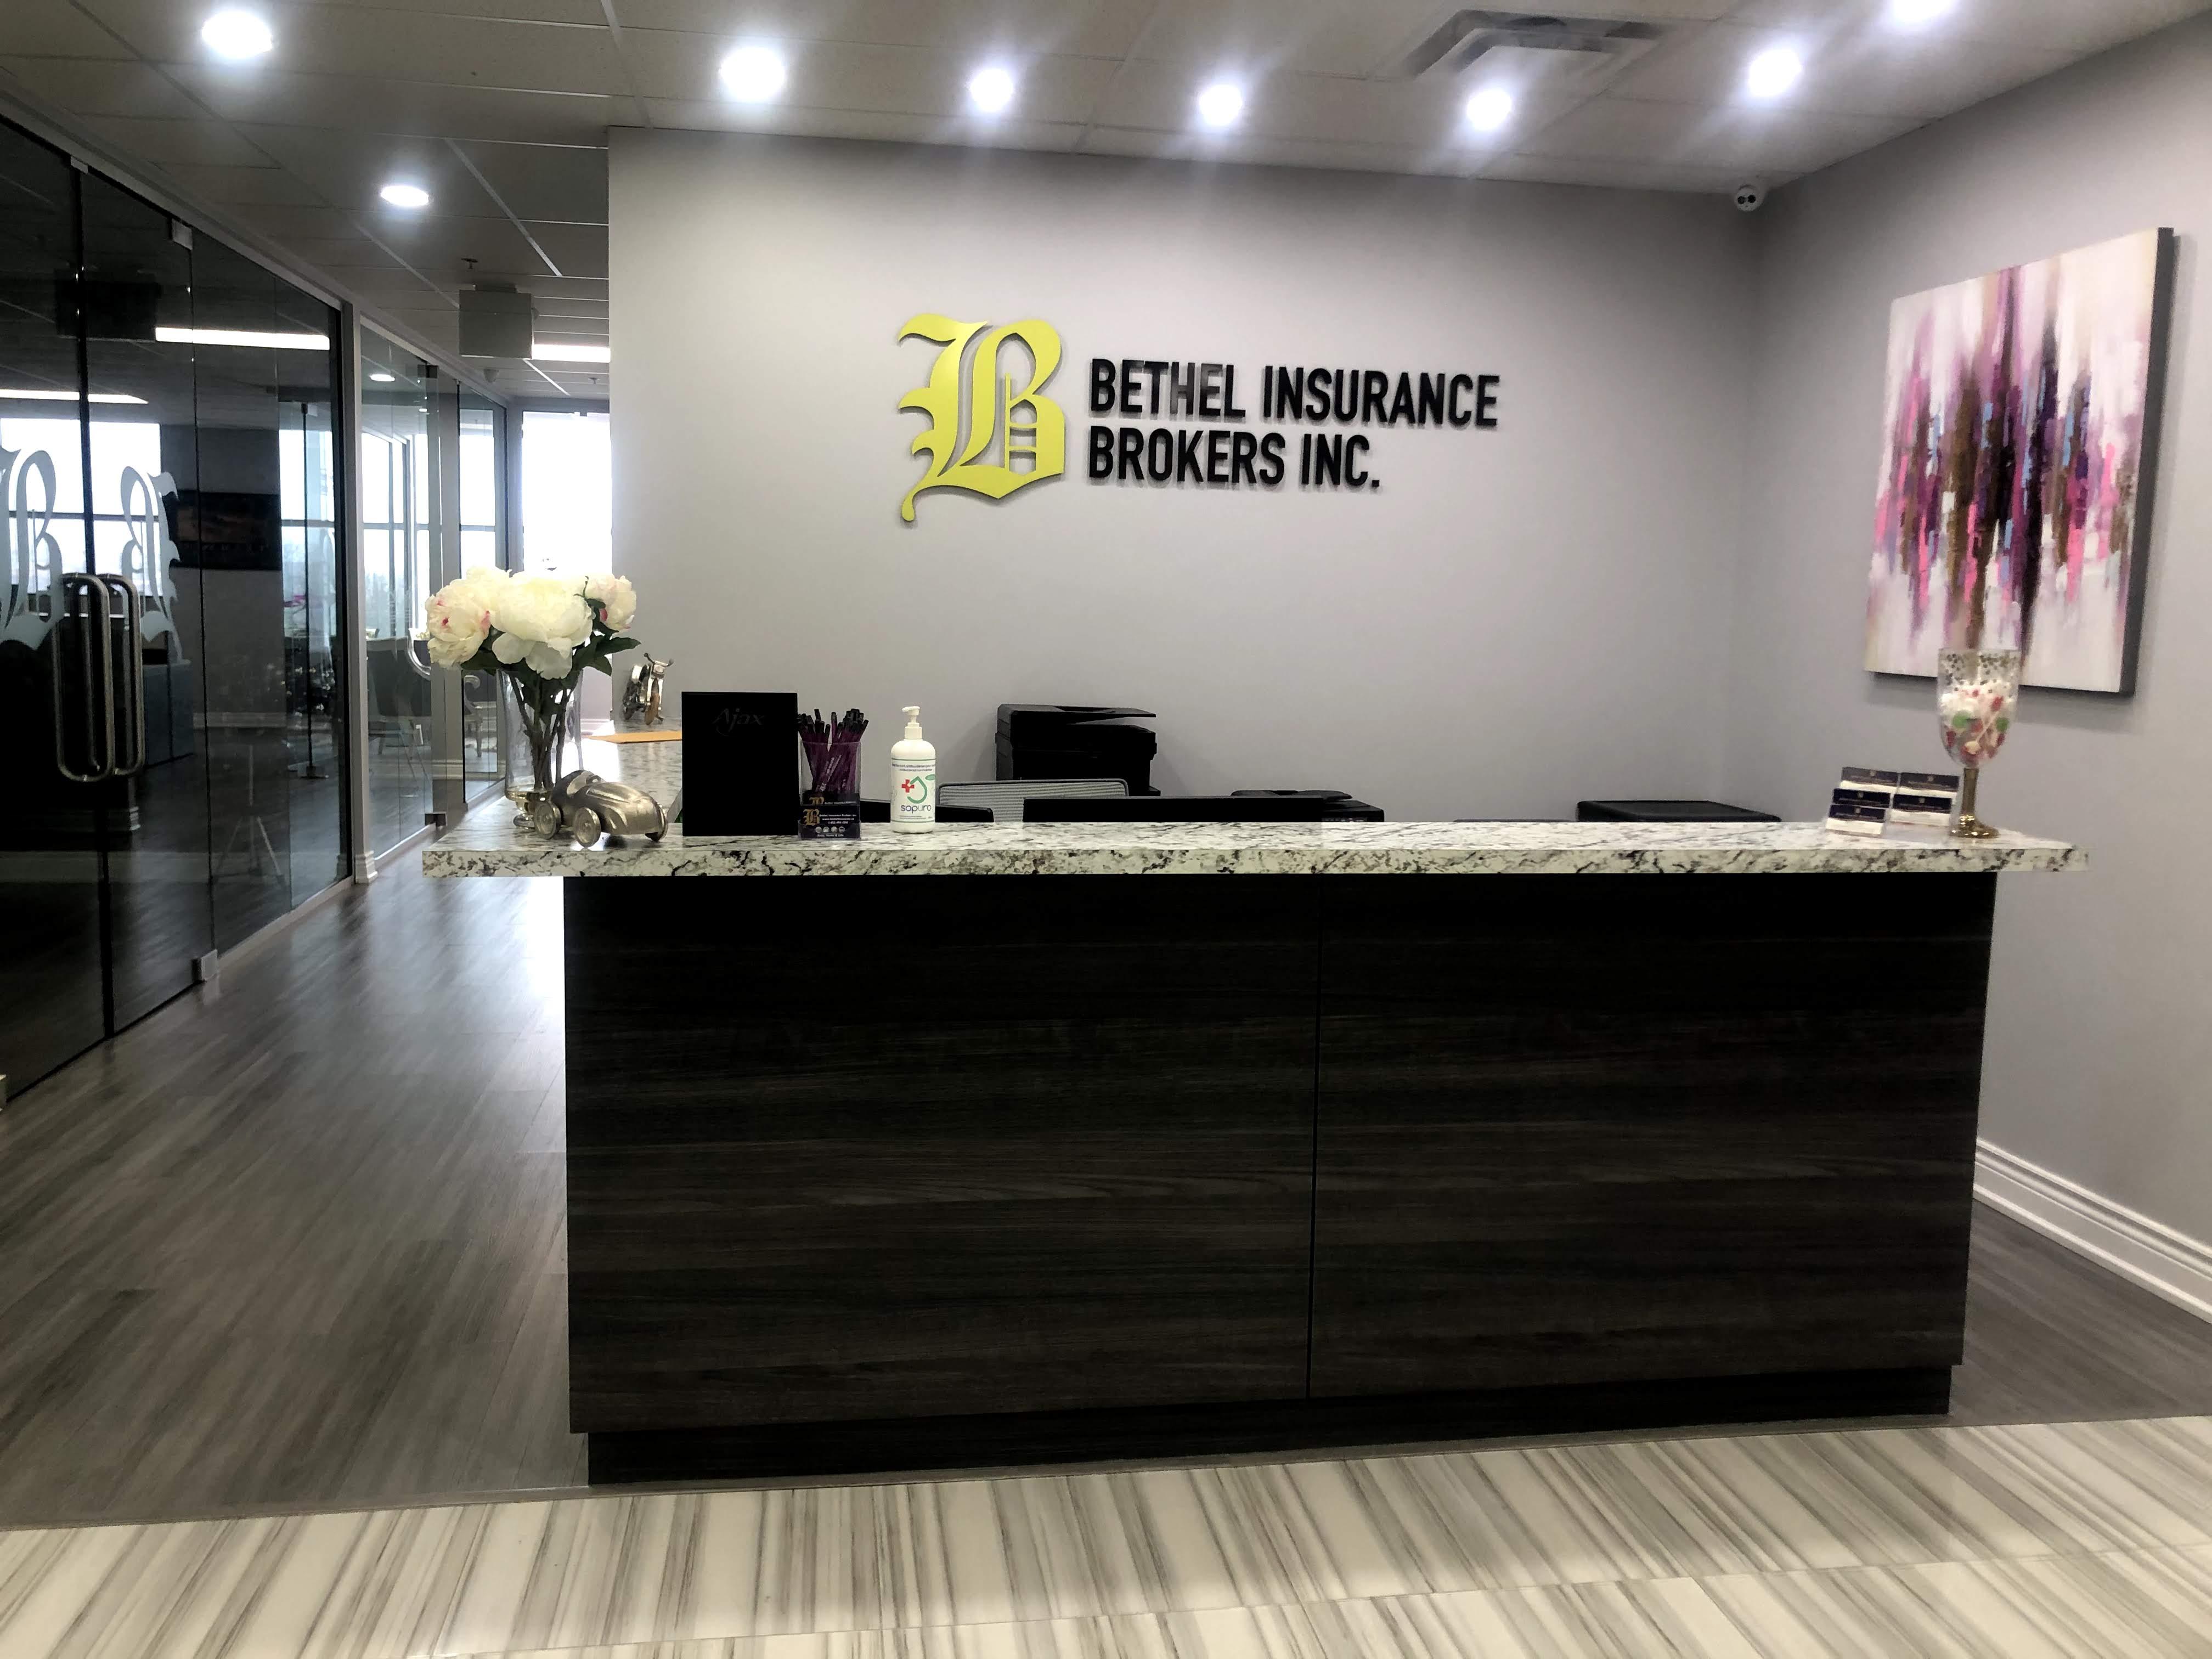 Bethel Insurance Brokers - Ajax, ON L1Z 0K4 - (905)683-2323 | ShowMeLocal.com